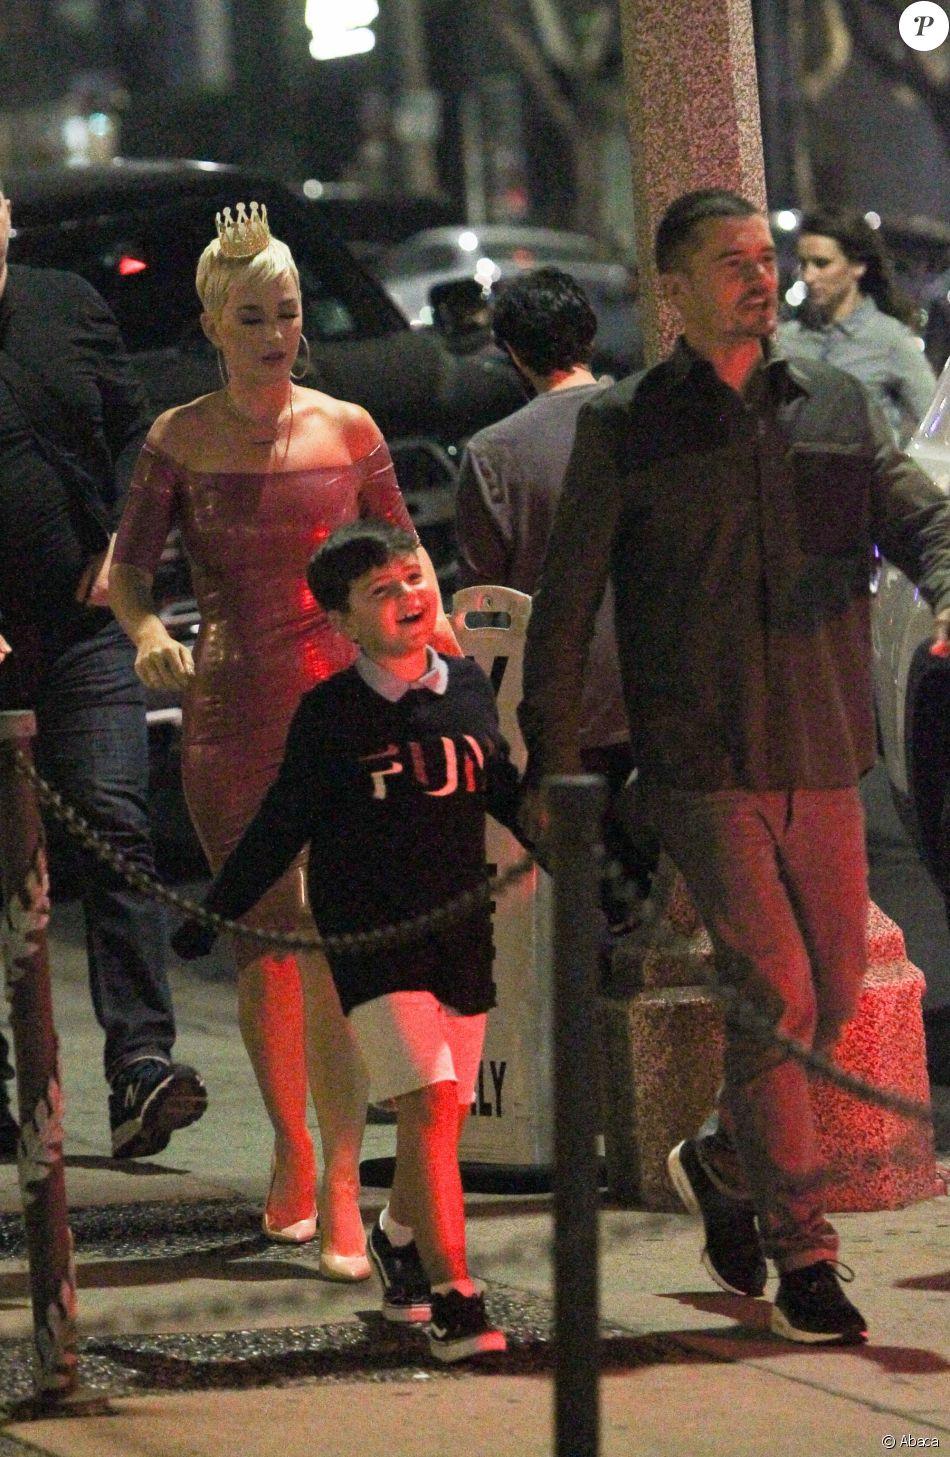 Katy Perry fête son anniversaire au Barton G Restaurant ! West Hollywood, Los Angeles, le 25 octobre 2018, avec Orlando Bloom et son fils Flynn.